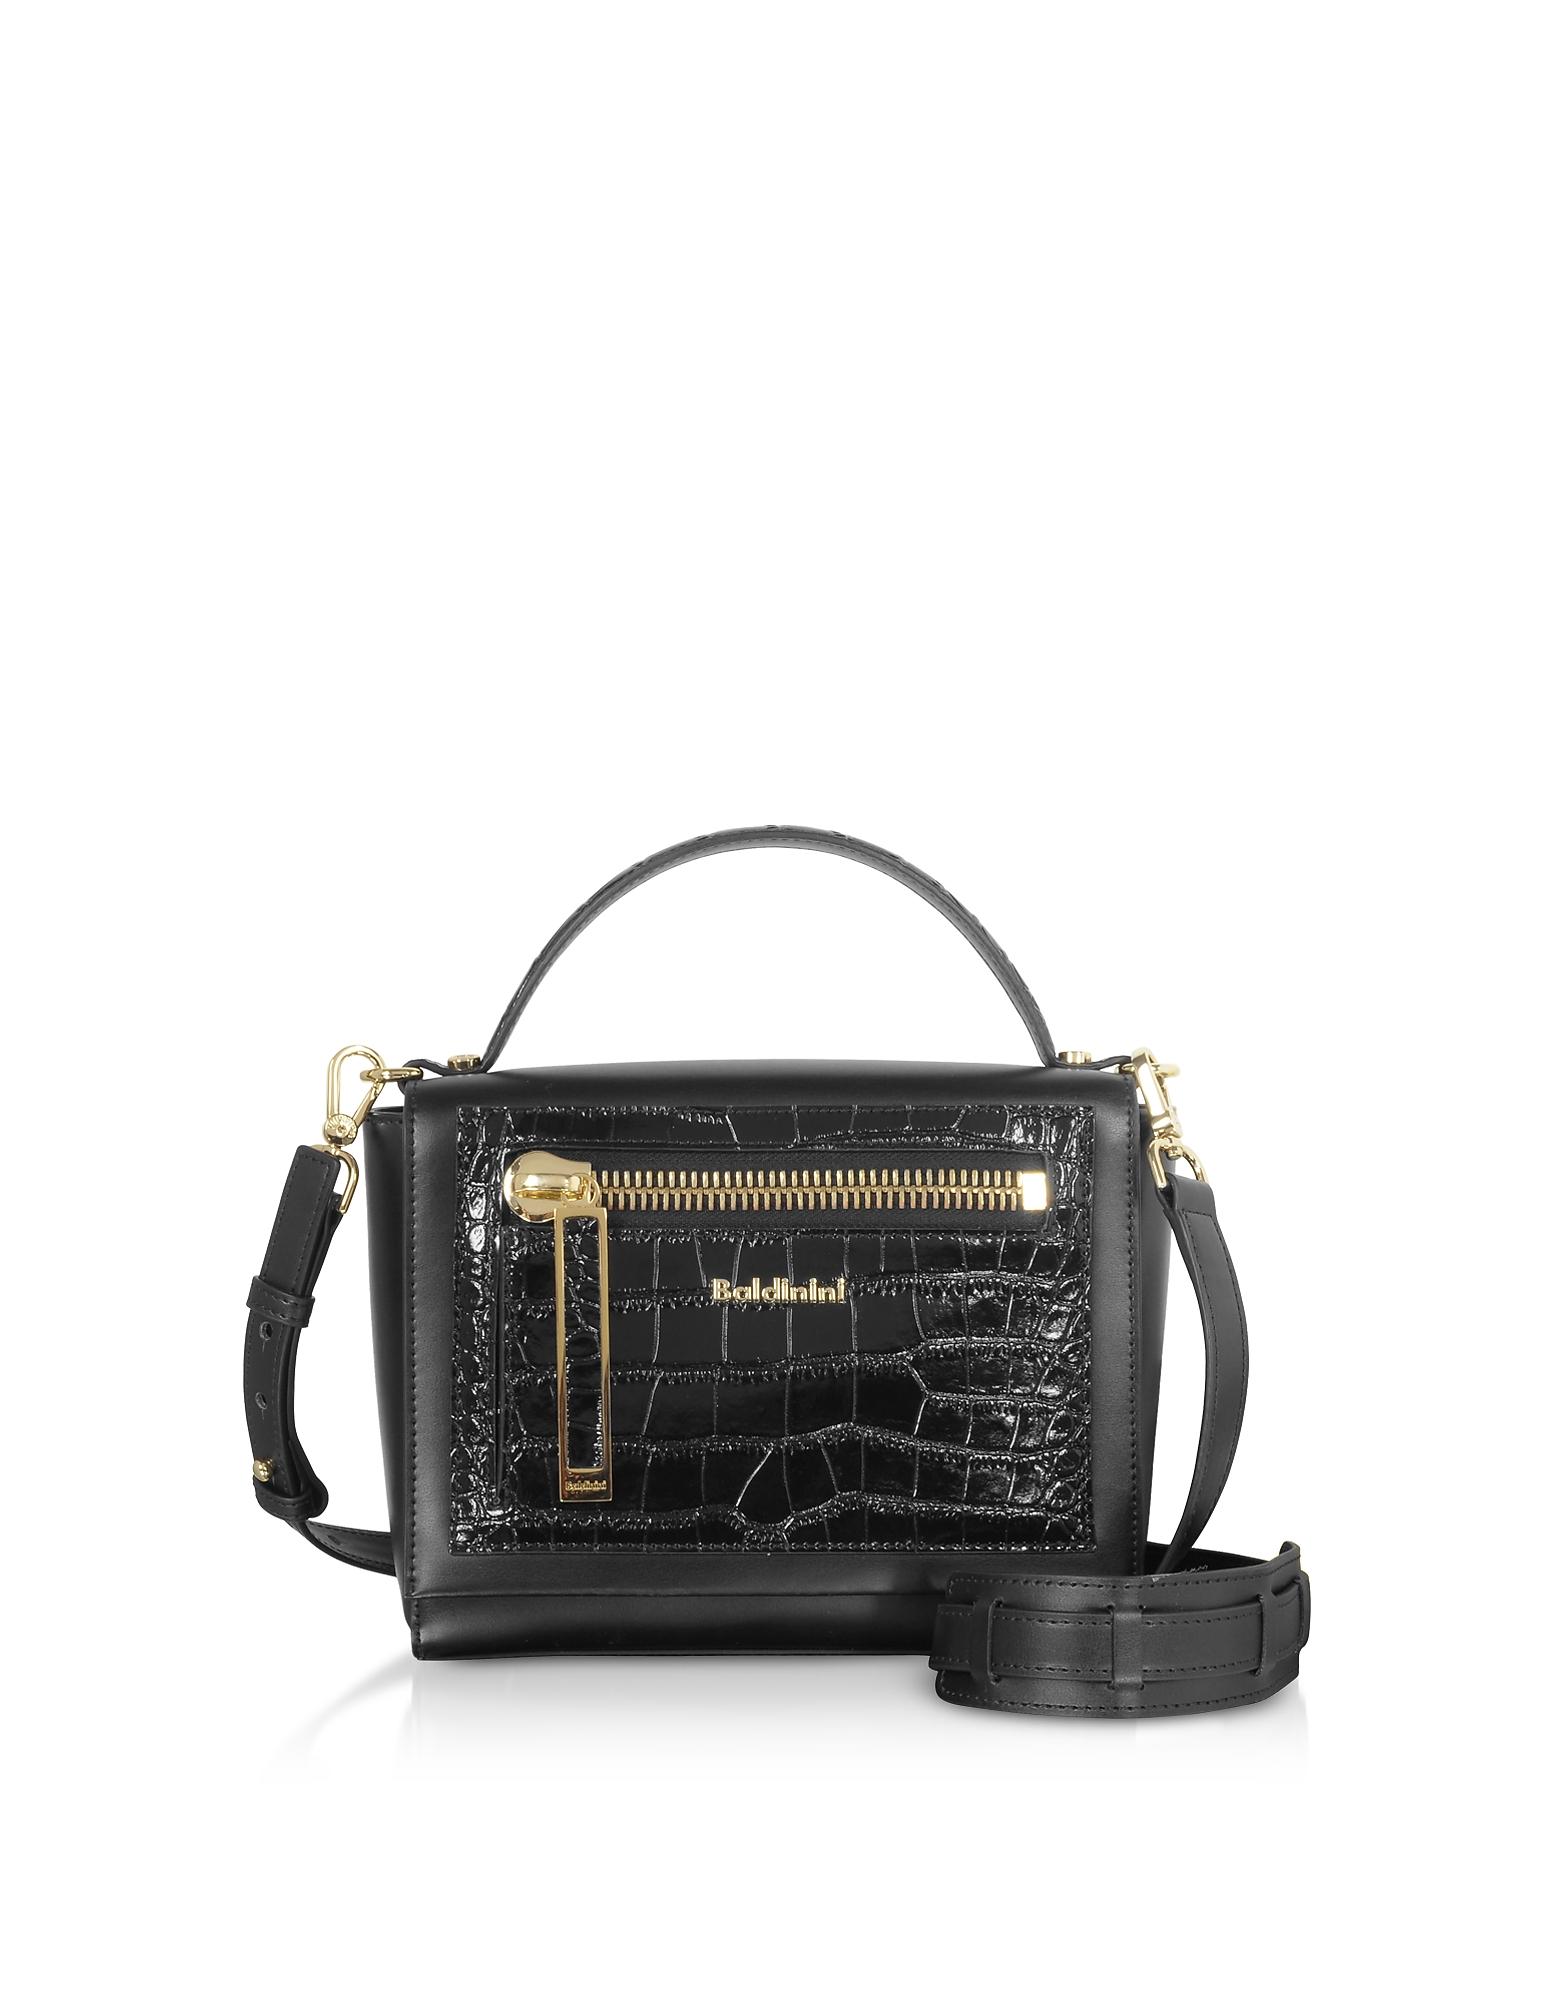 Baldinini Designer Handbags, Sophie Croco Embossed Leather Shoulder Bag